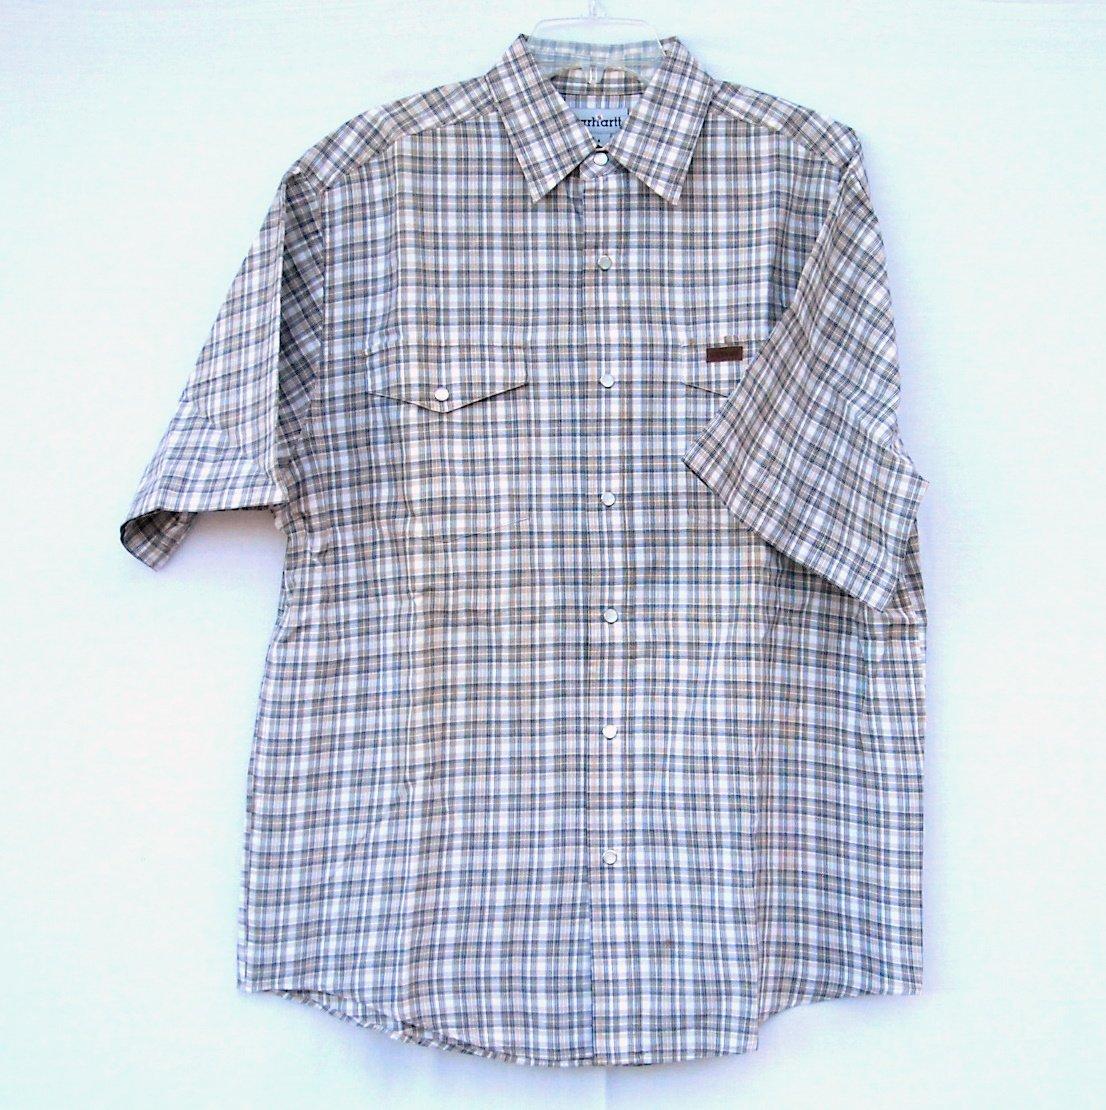 Carhartt men's short sleeve shirt size M Medium